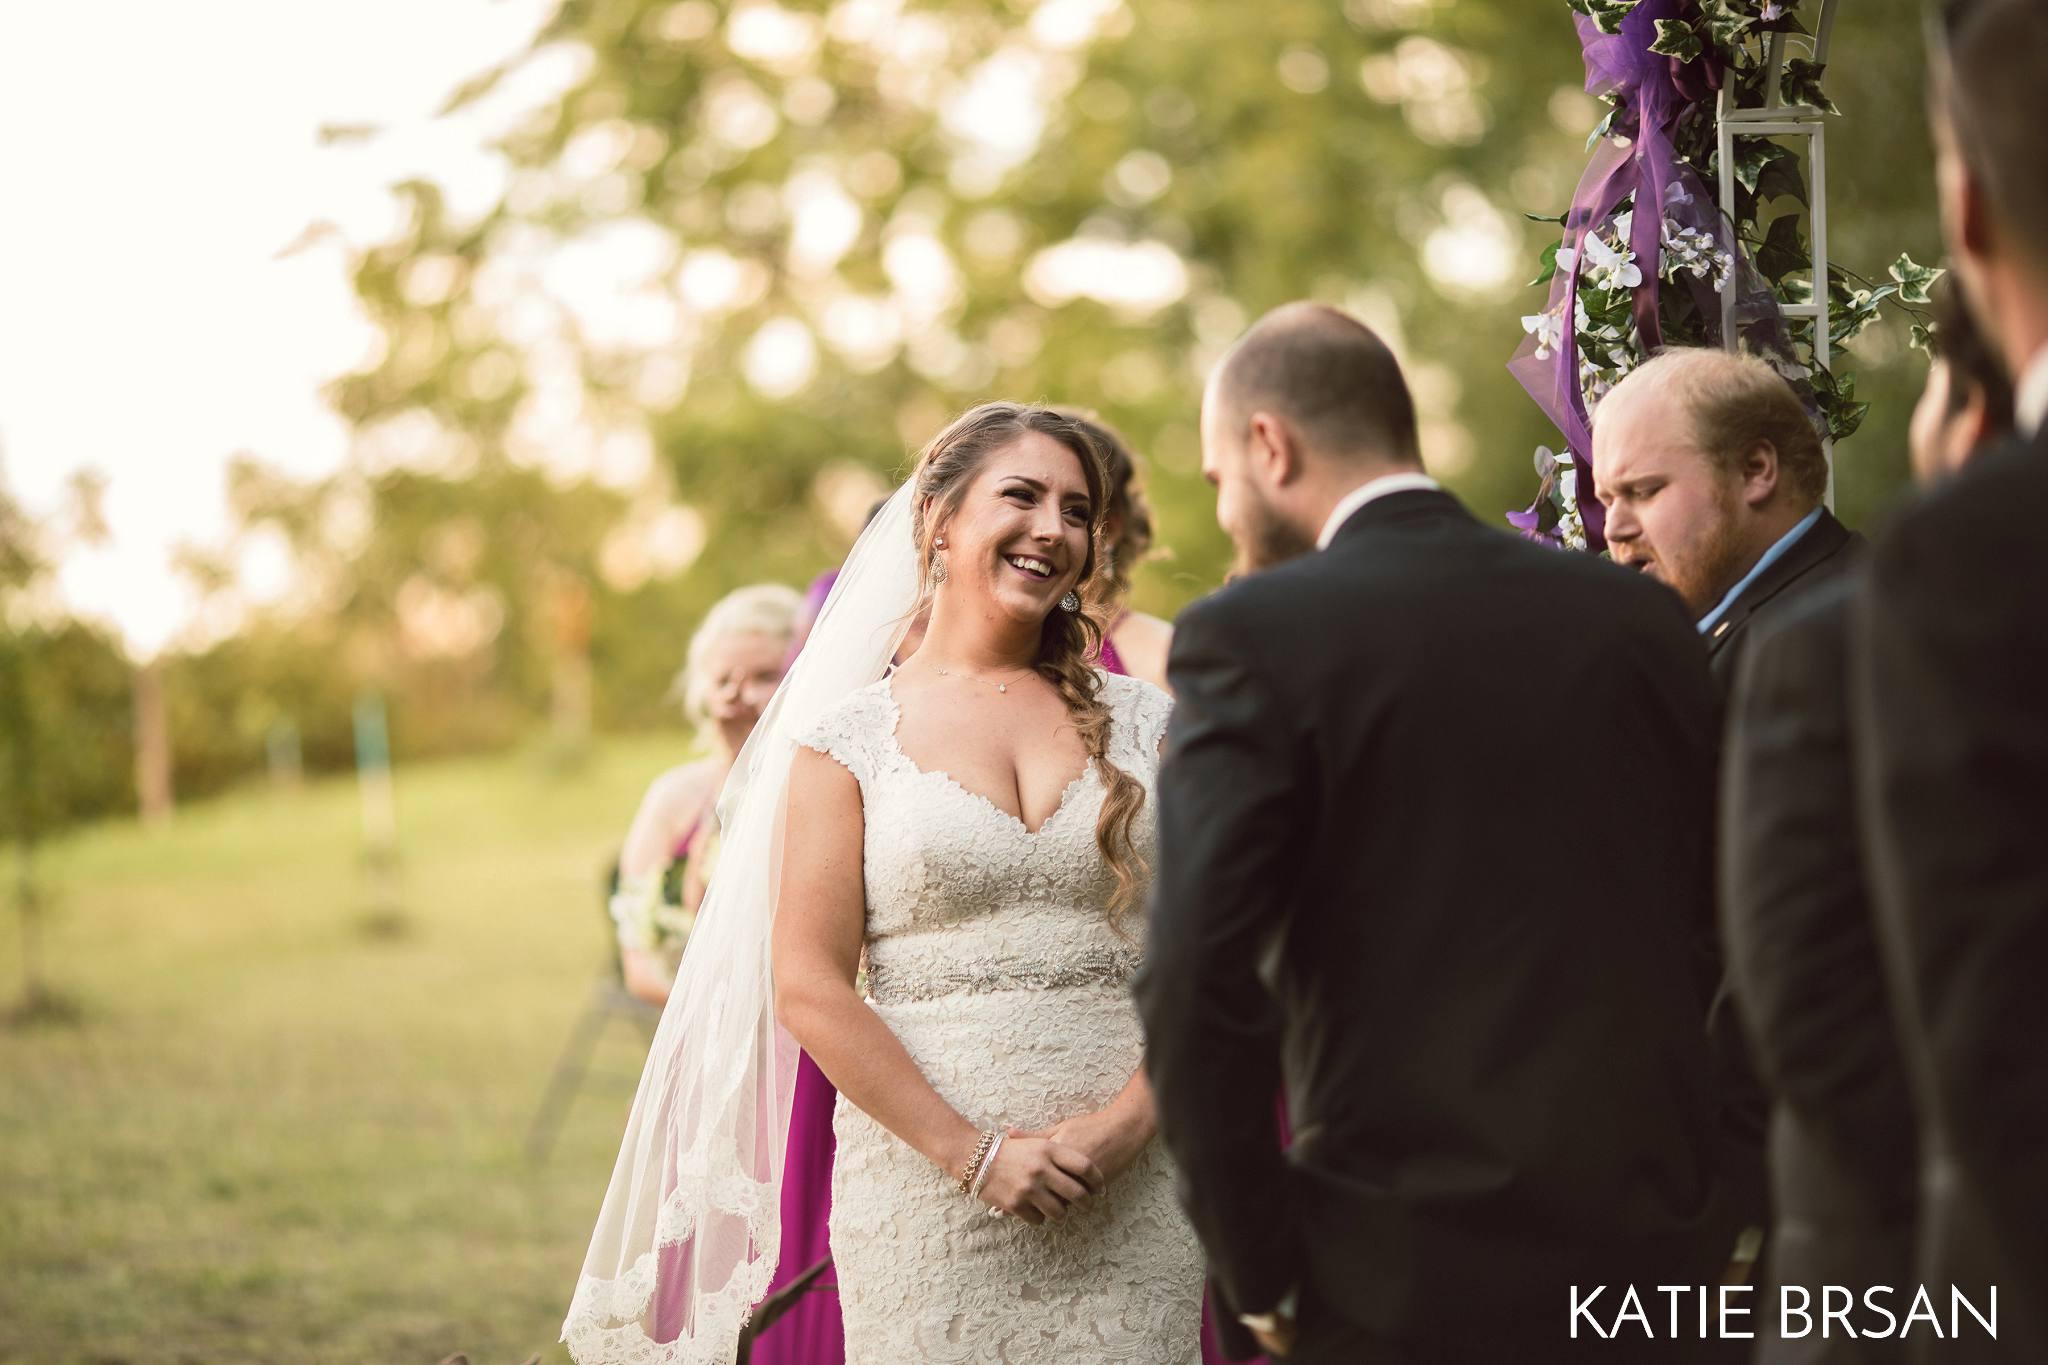 KatieBrsan-Bonfield-Backyard-Wedding_0405.jpg